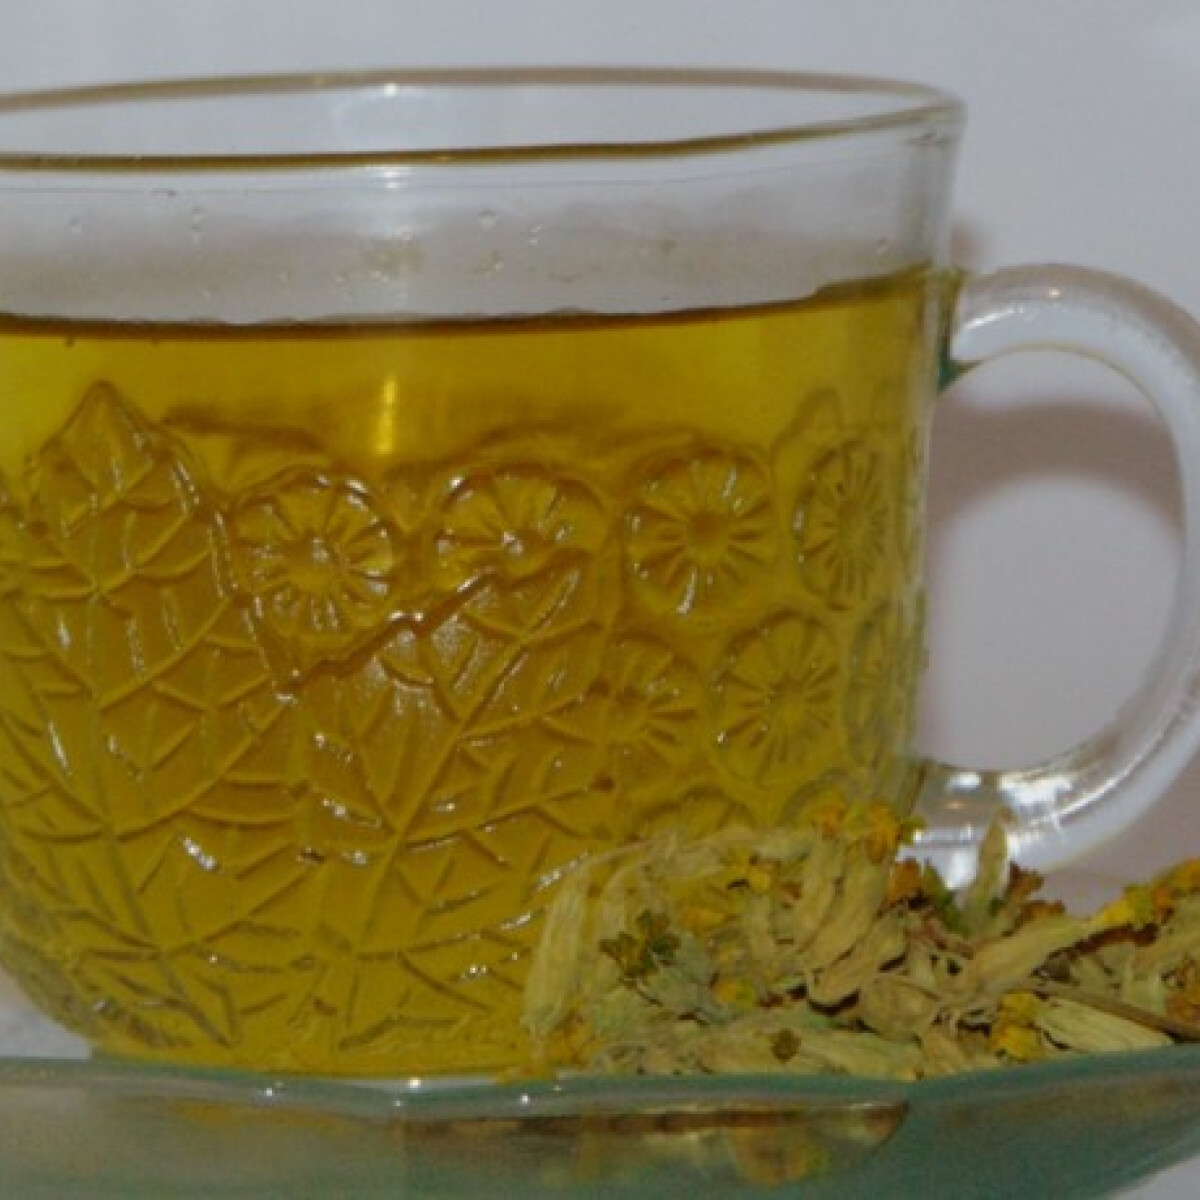 Kankalinos citromfűtea